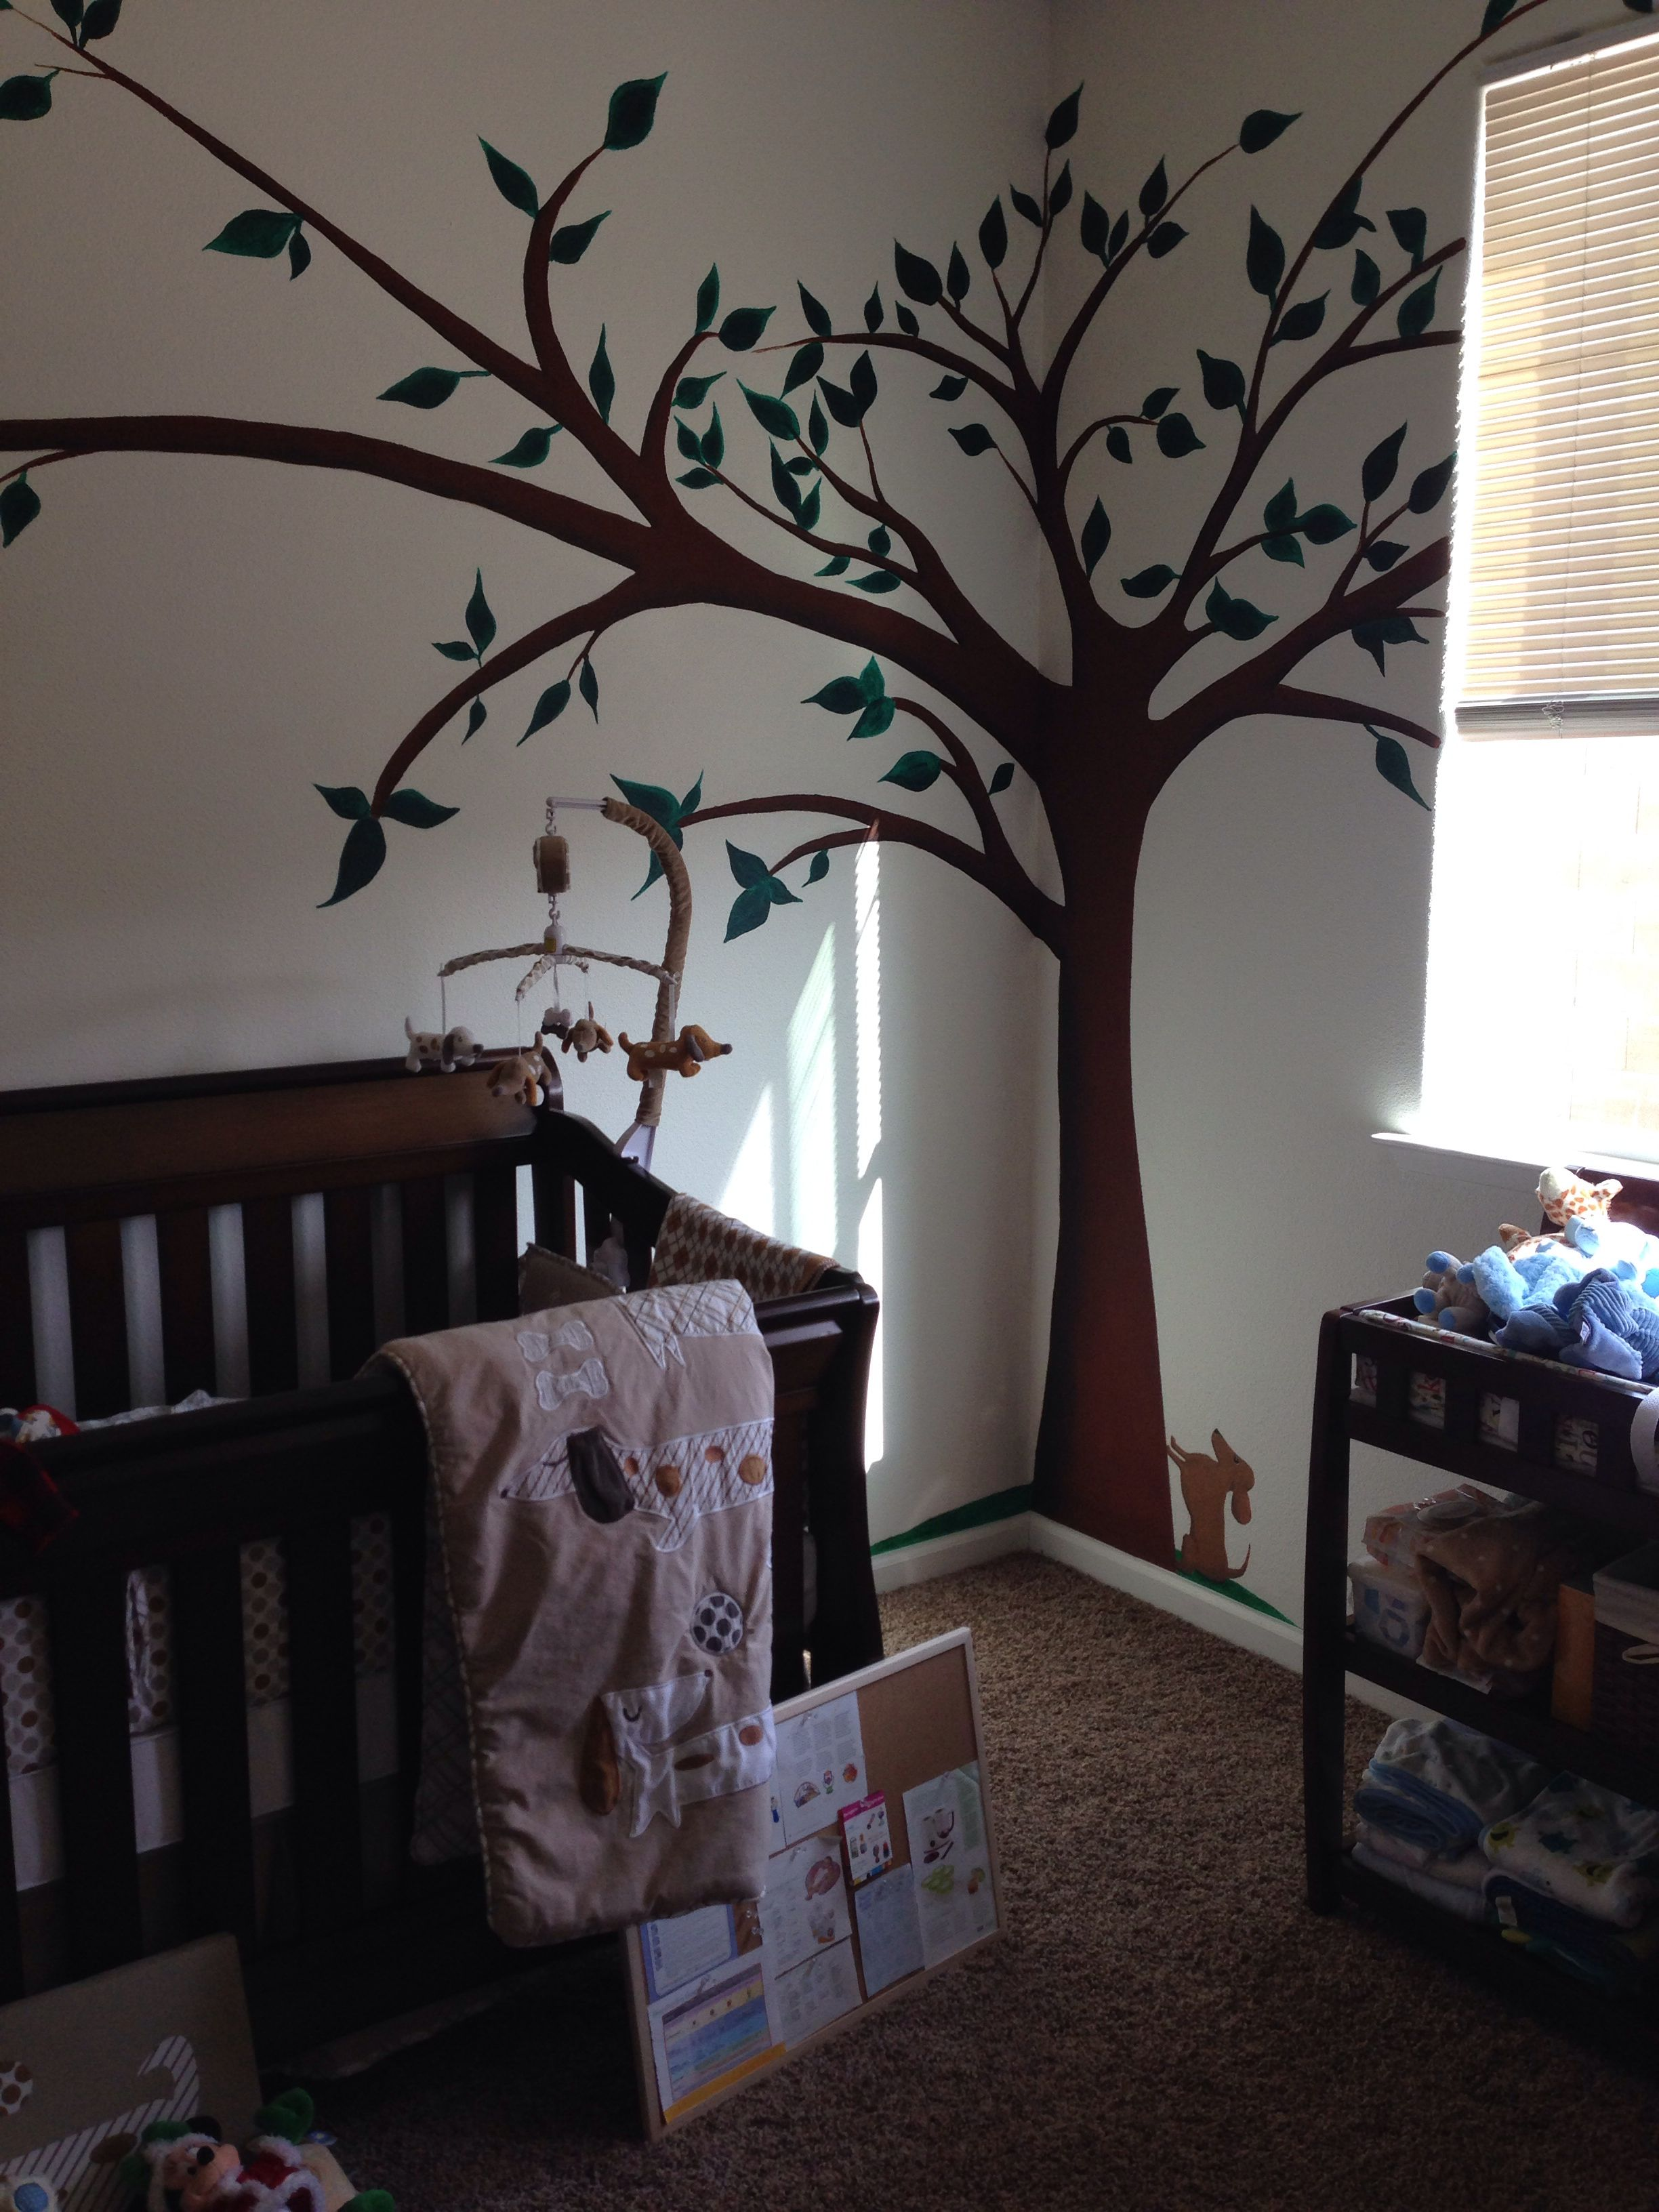 Jacksons nursery dachshund and a tree home decor